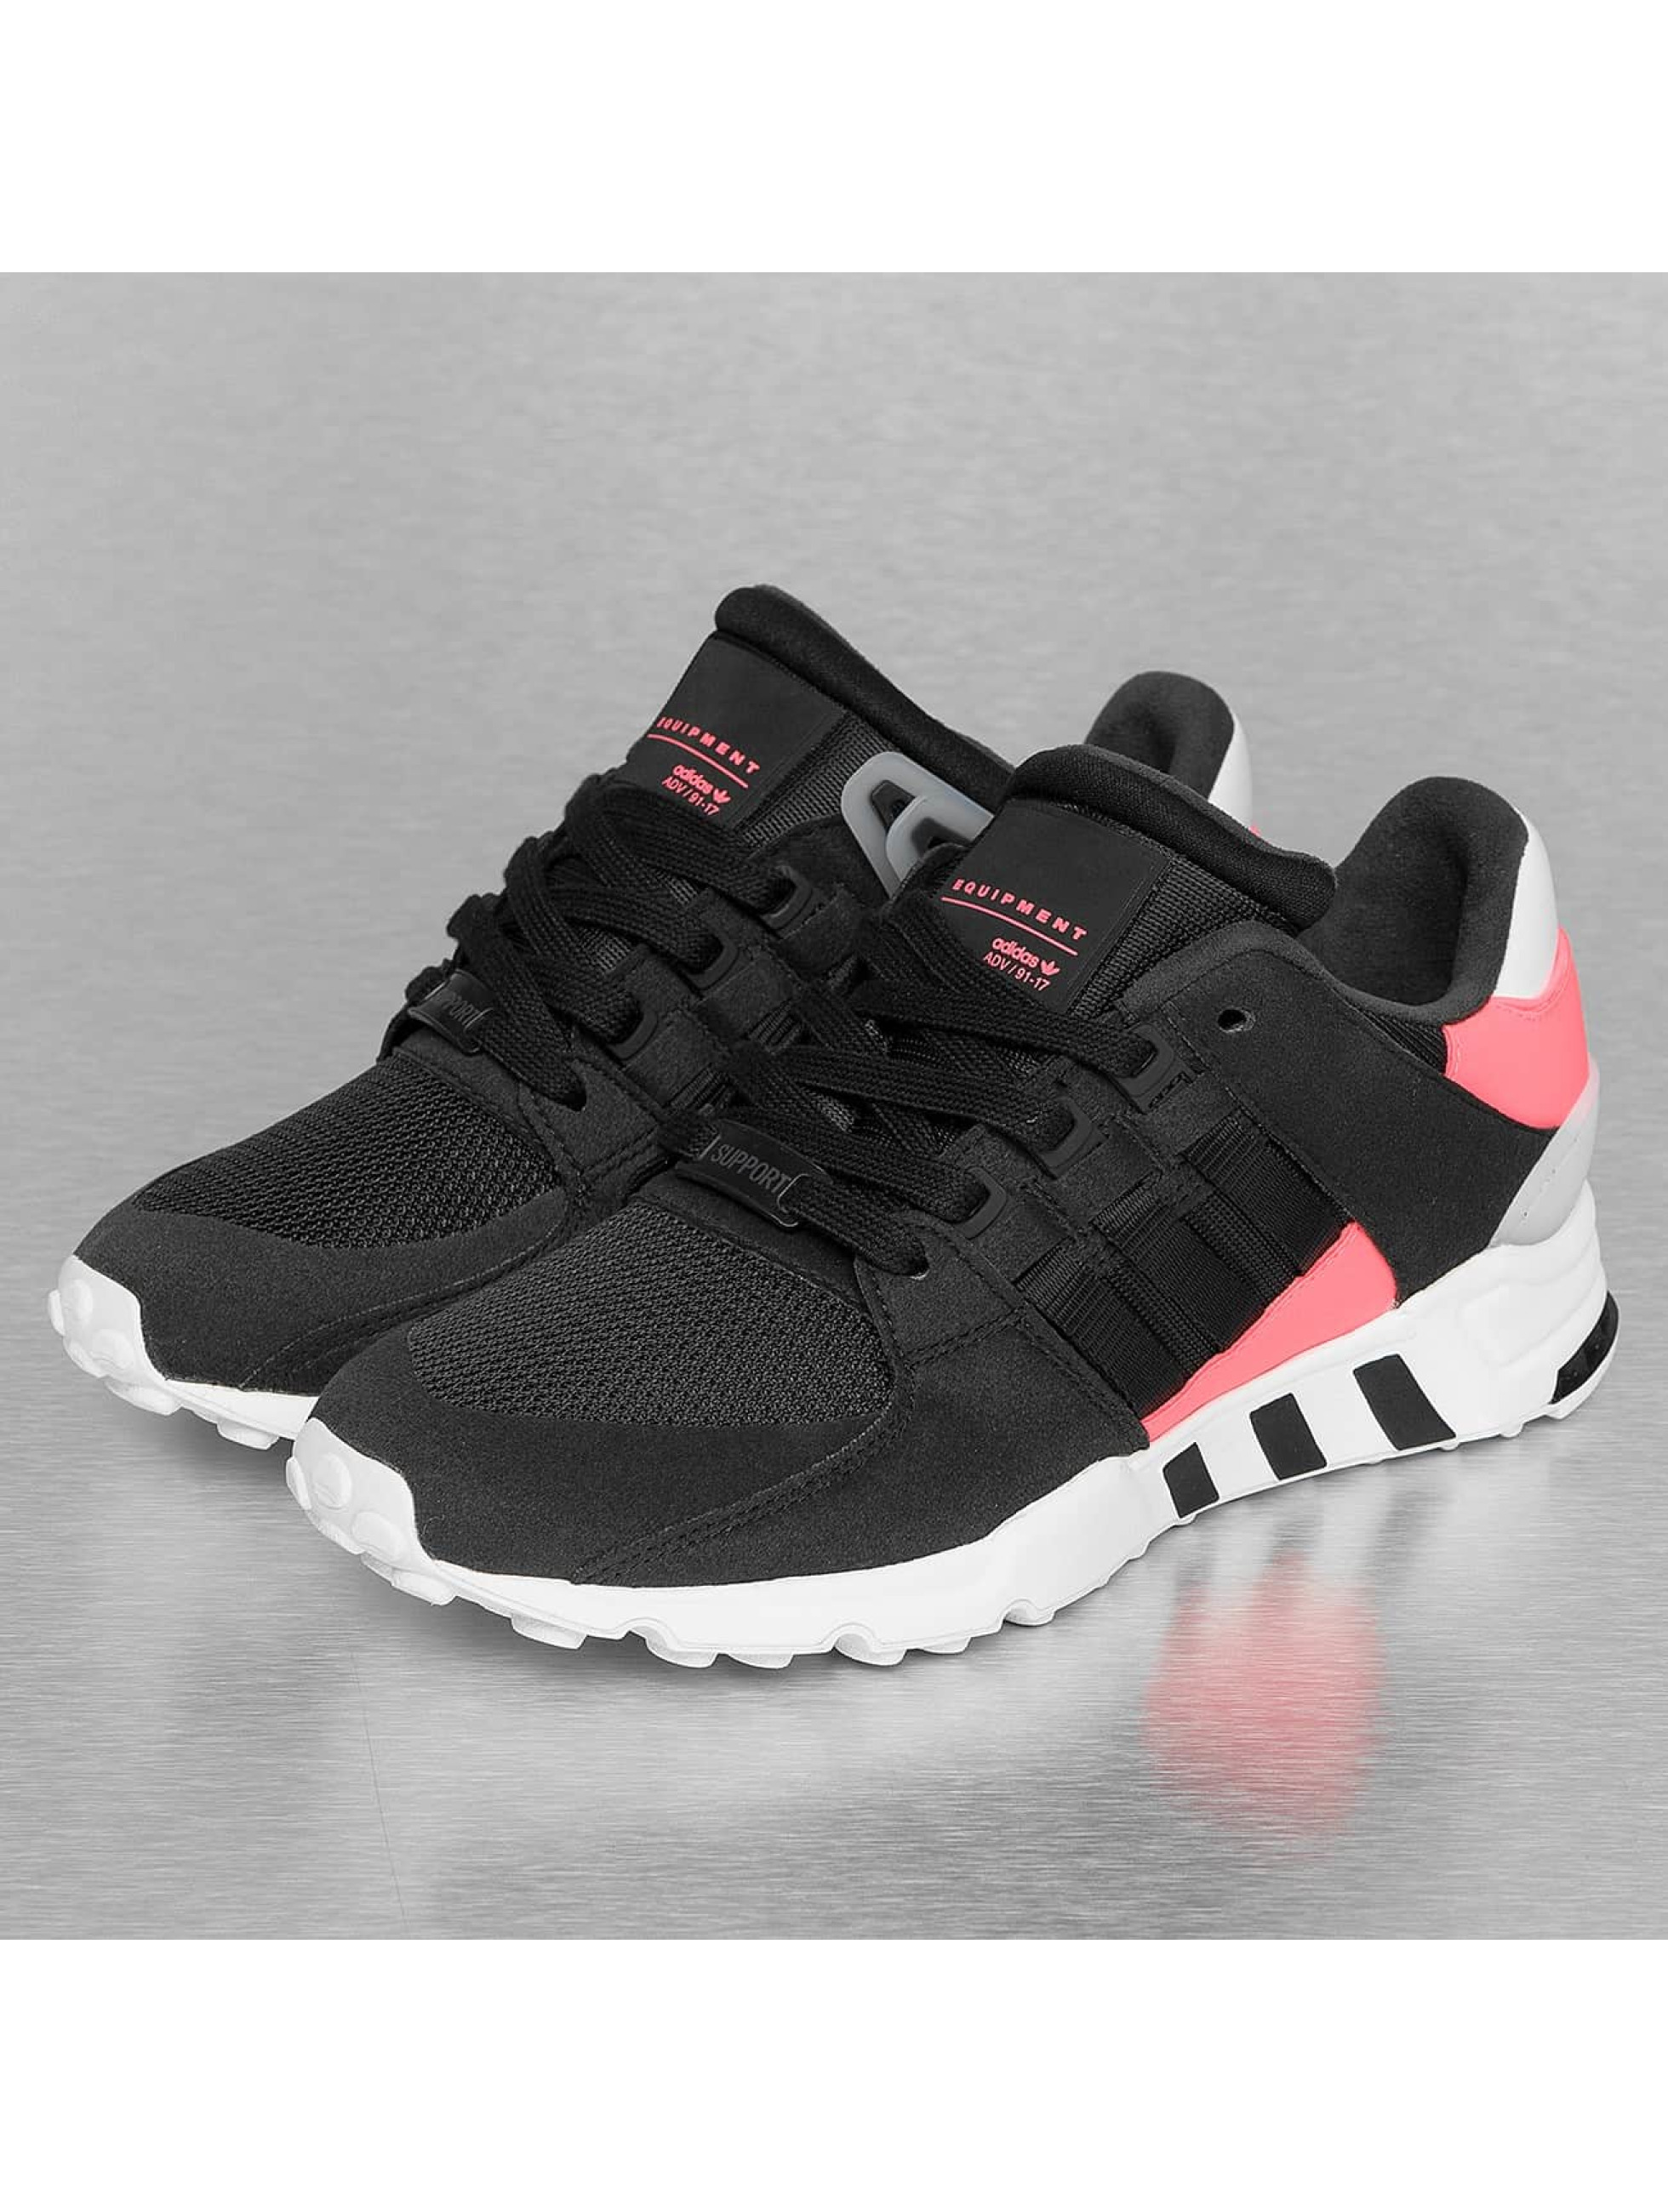 adidas Frauen Sneaker Equipment Support RF in schwarz